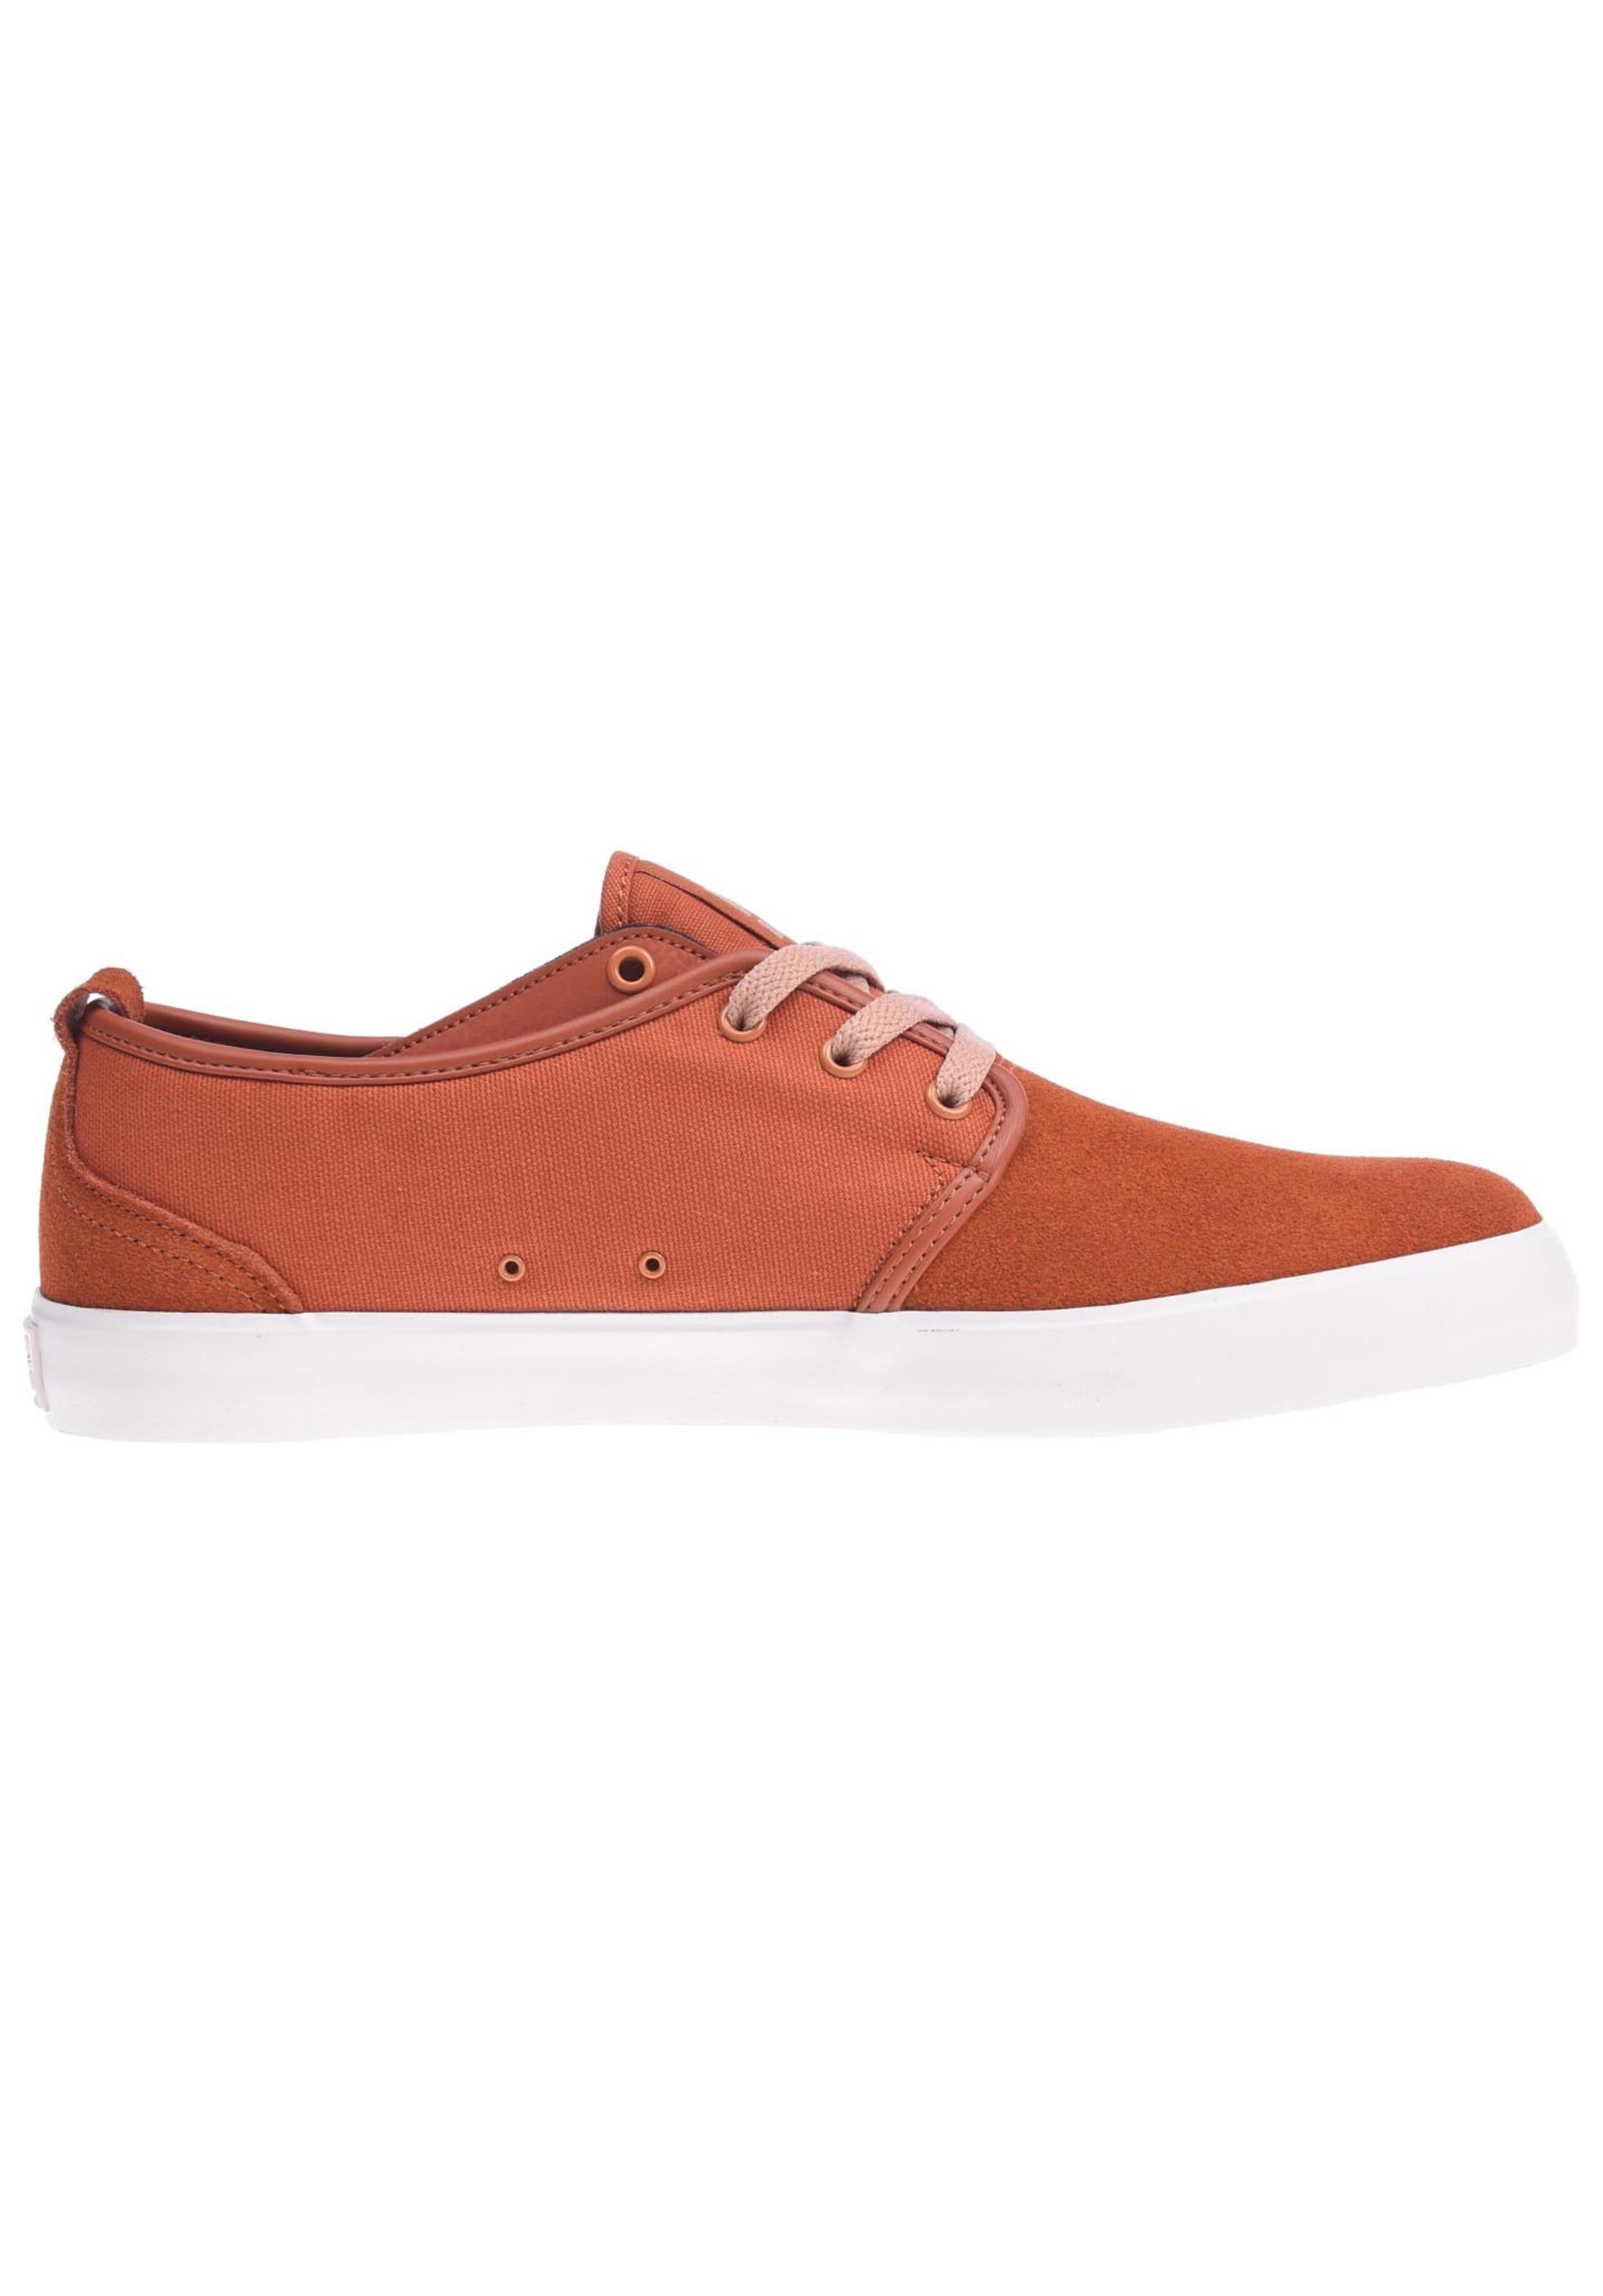 'studio In Rostbraun Shoes Dc 2' Sneaker j4A5R3Lq